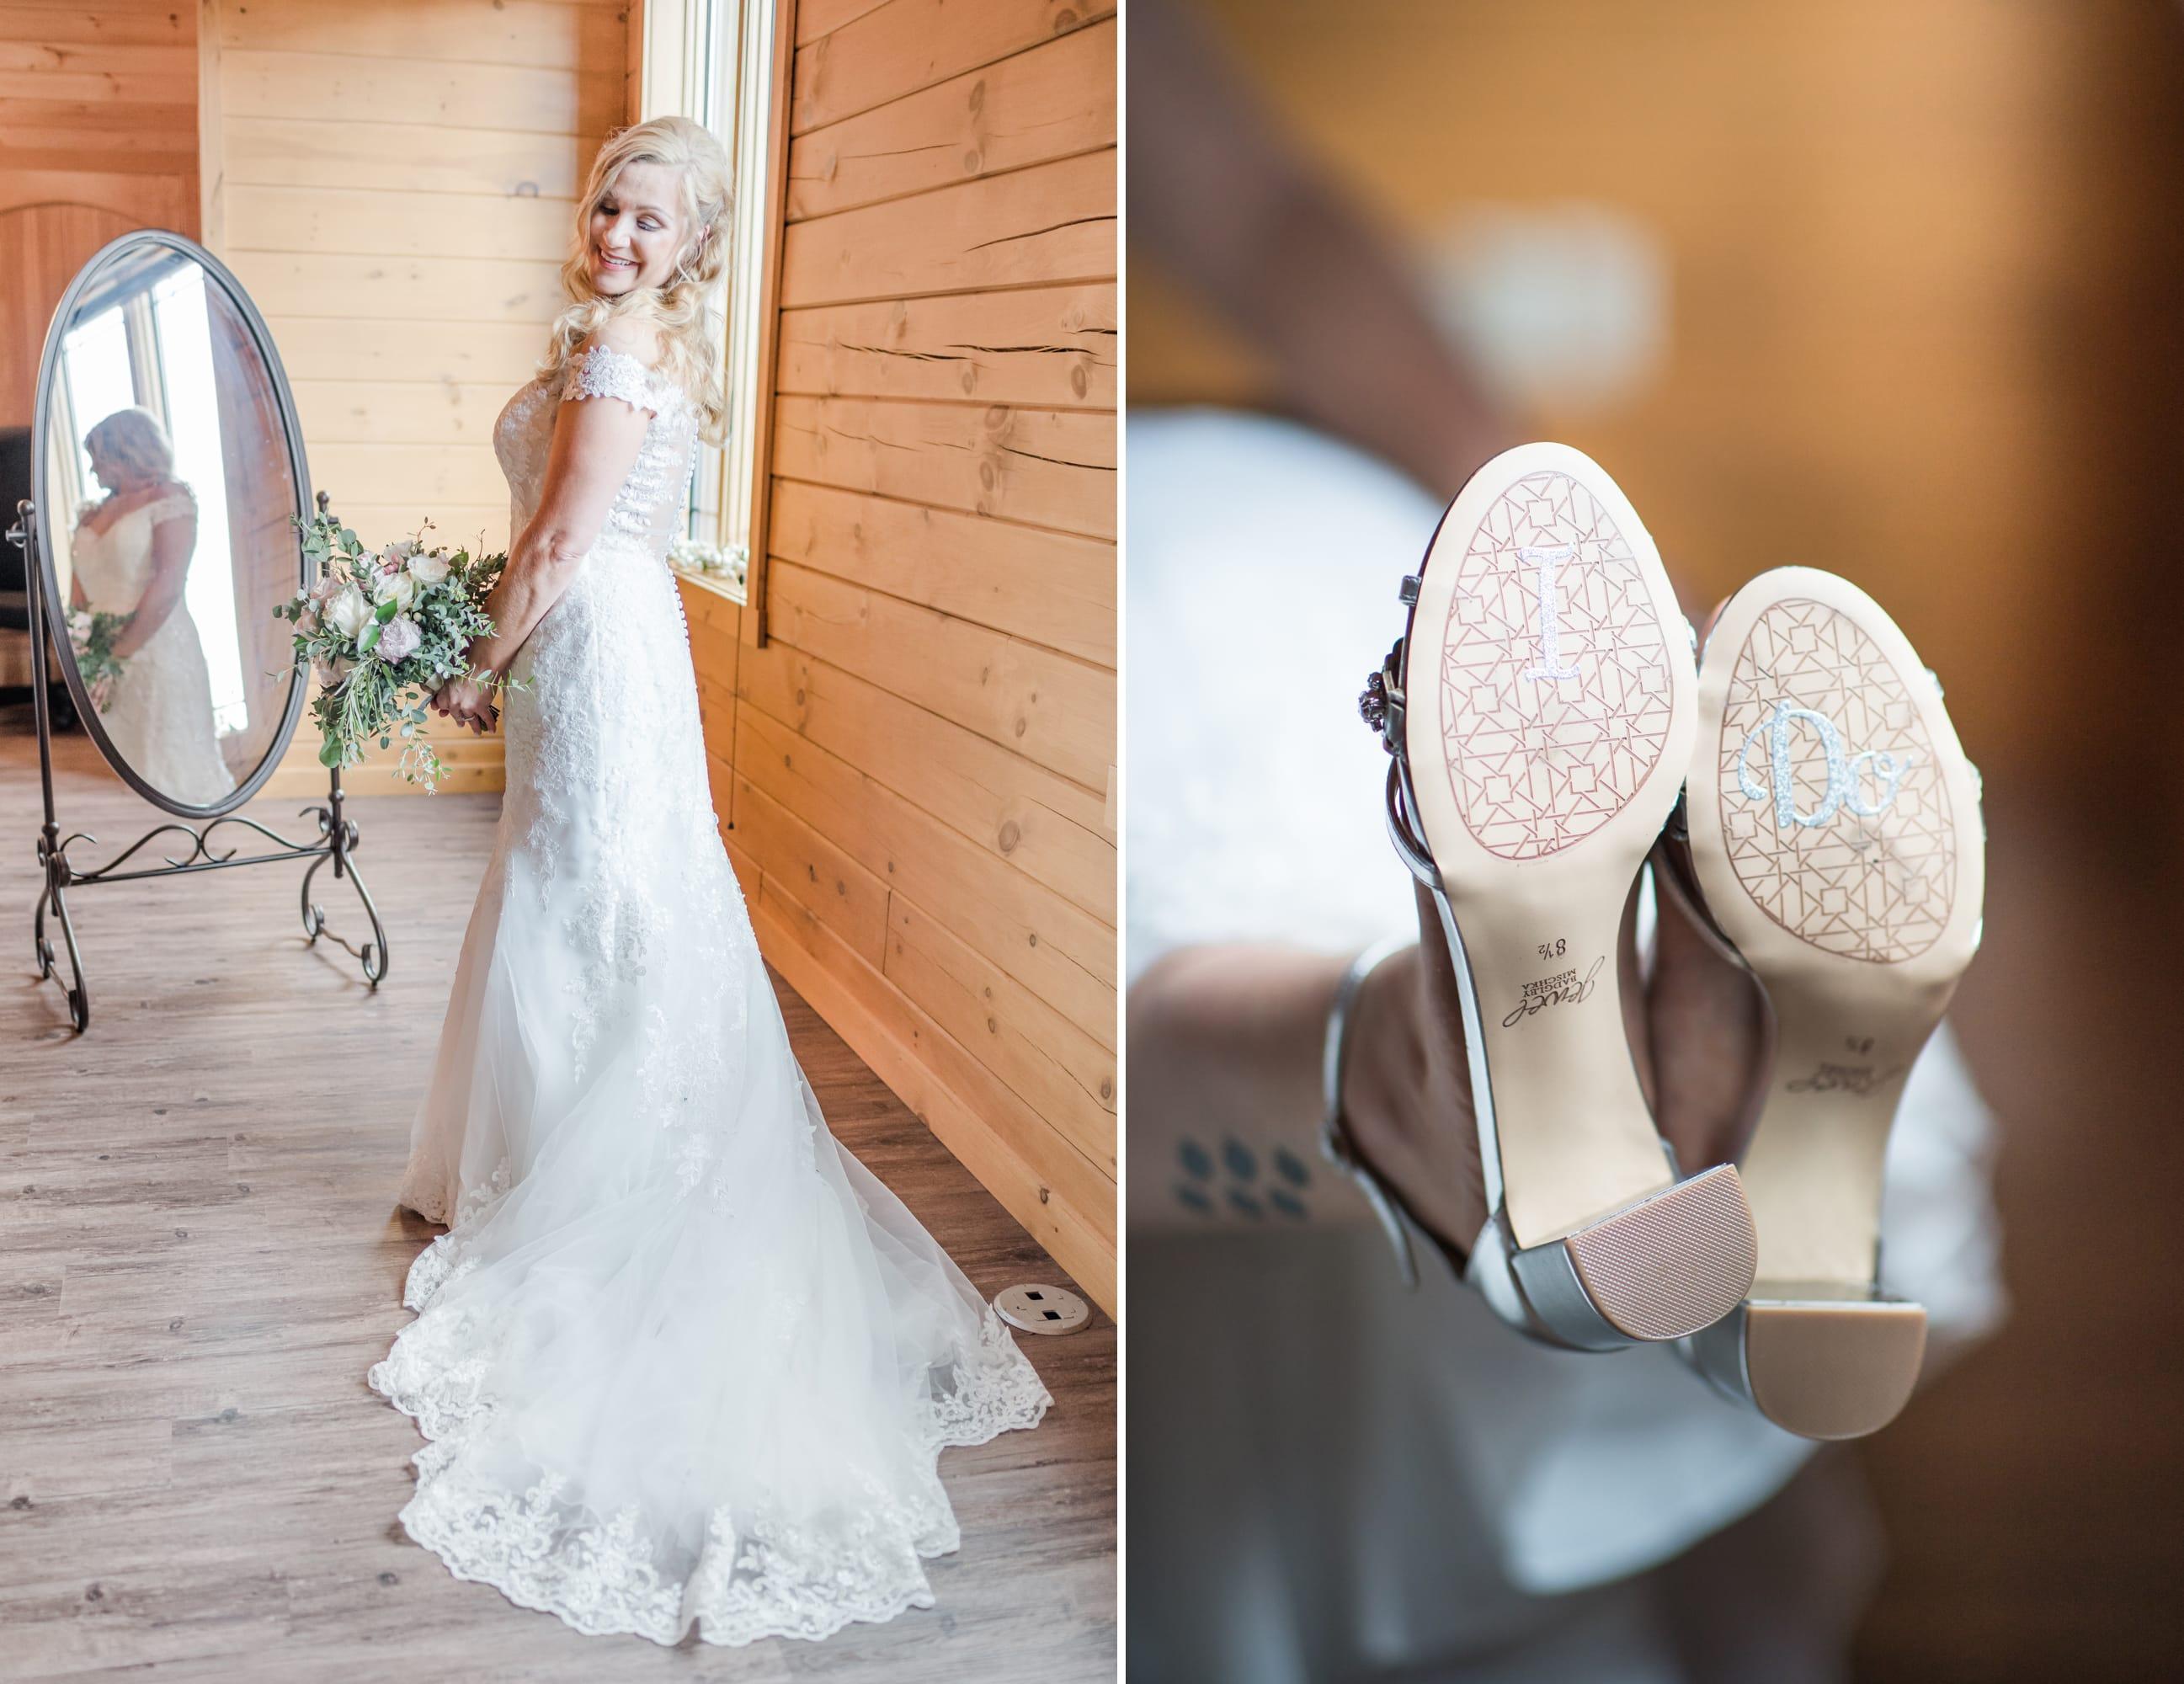 Bridal portrait at Rolling Rails Lodge wedding